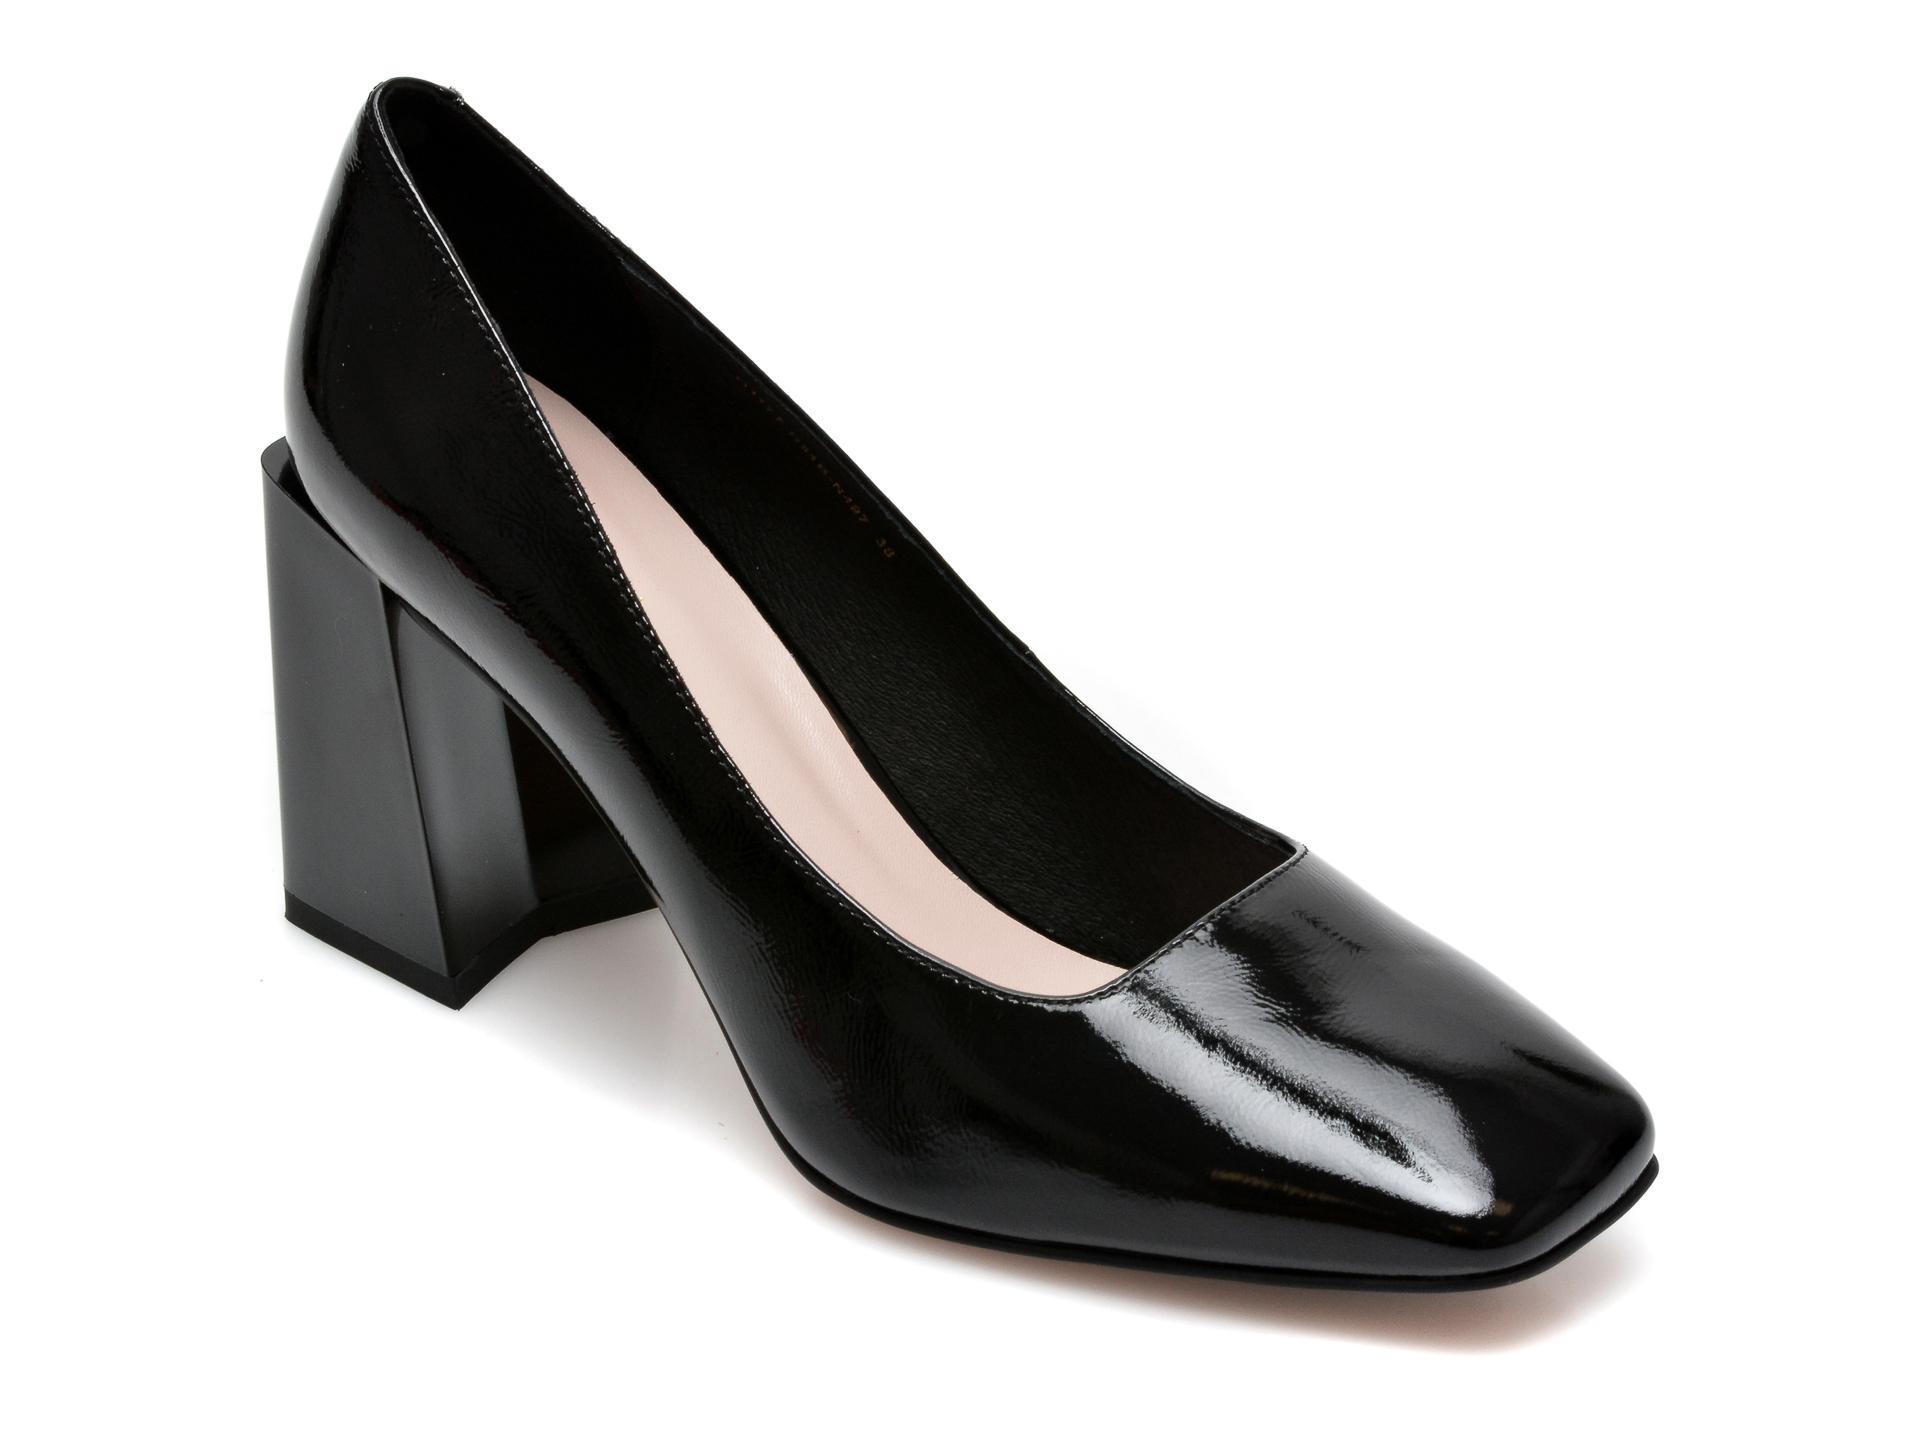 Pantofi EPICA negri, G1177R5, din piele naturala lacuita imagine otter.ro